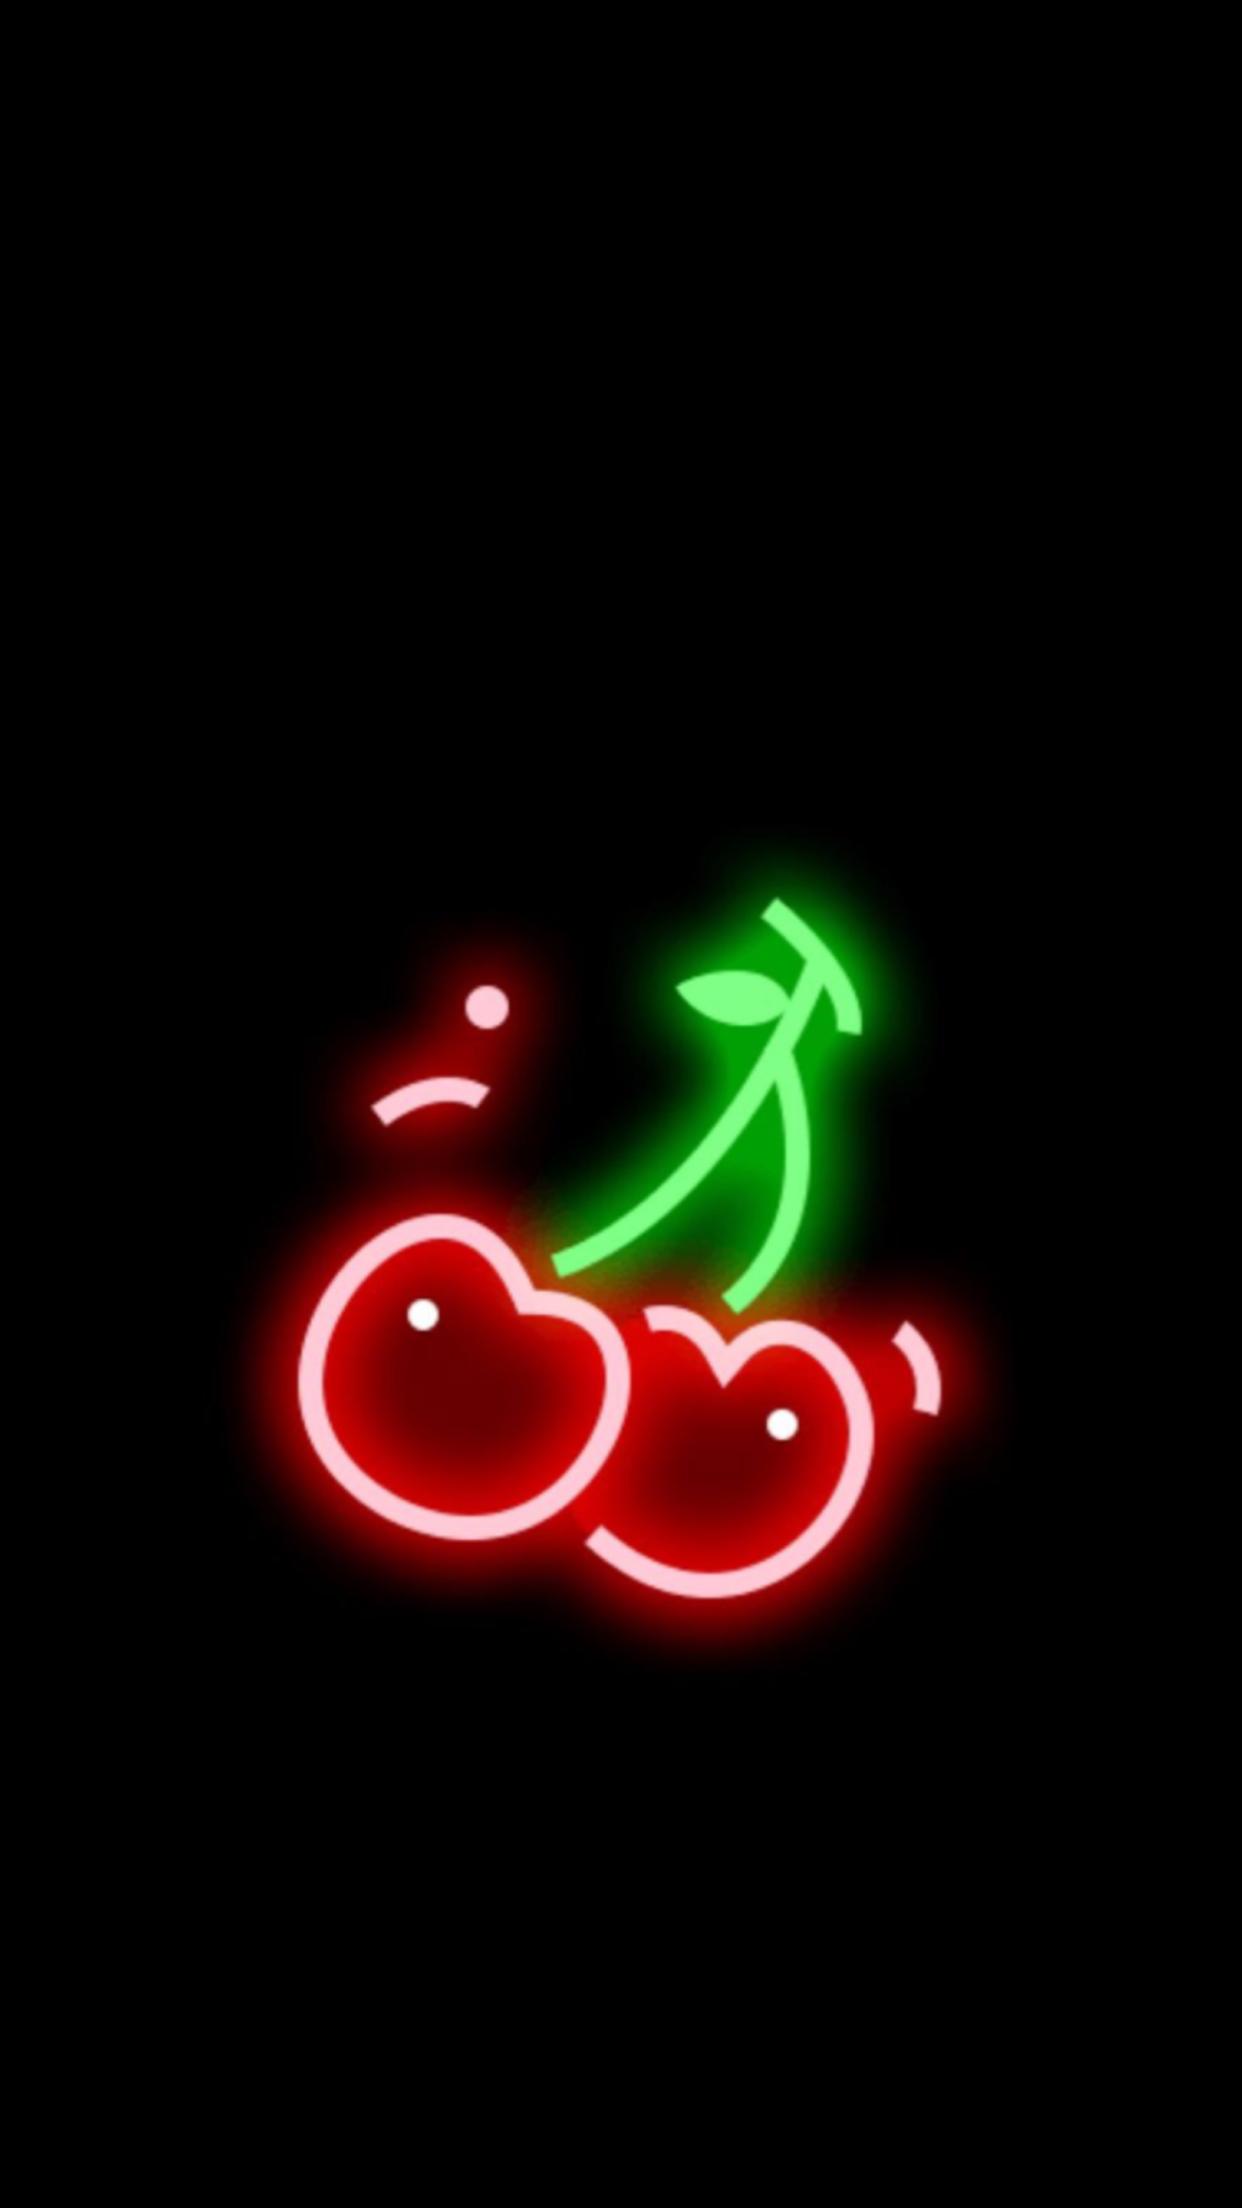 Follow me Nimisha Neha (With images) Neon wallpaper